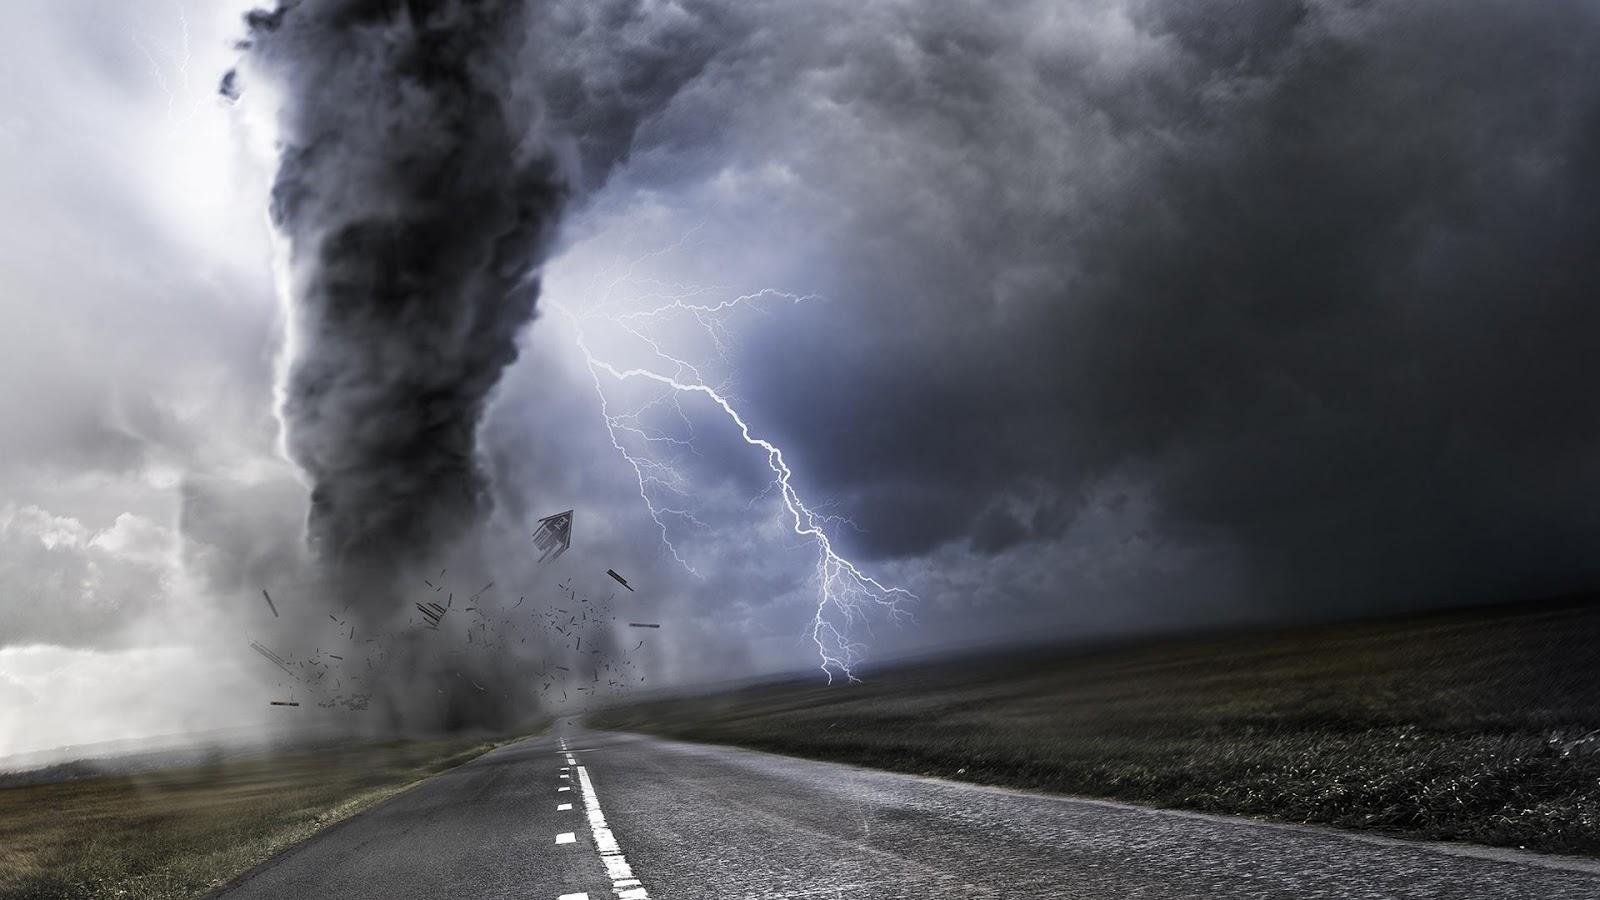 Storm Battle?Soldier Heroes v5.0 (Mod Money) Immagini